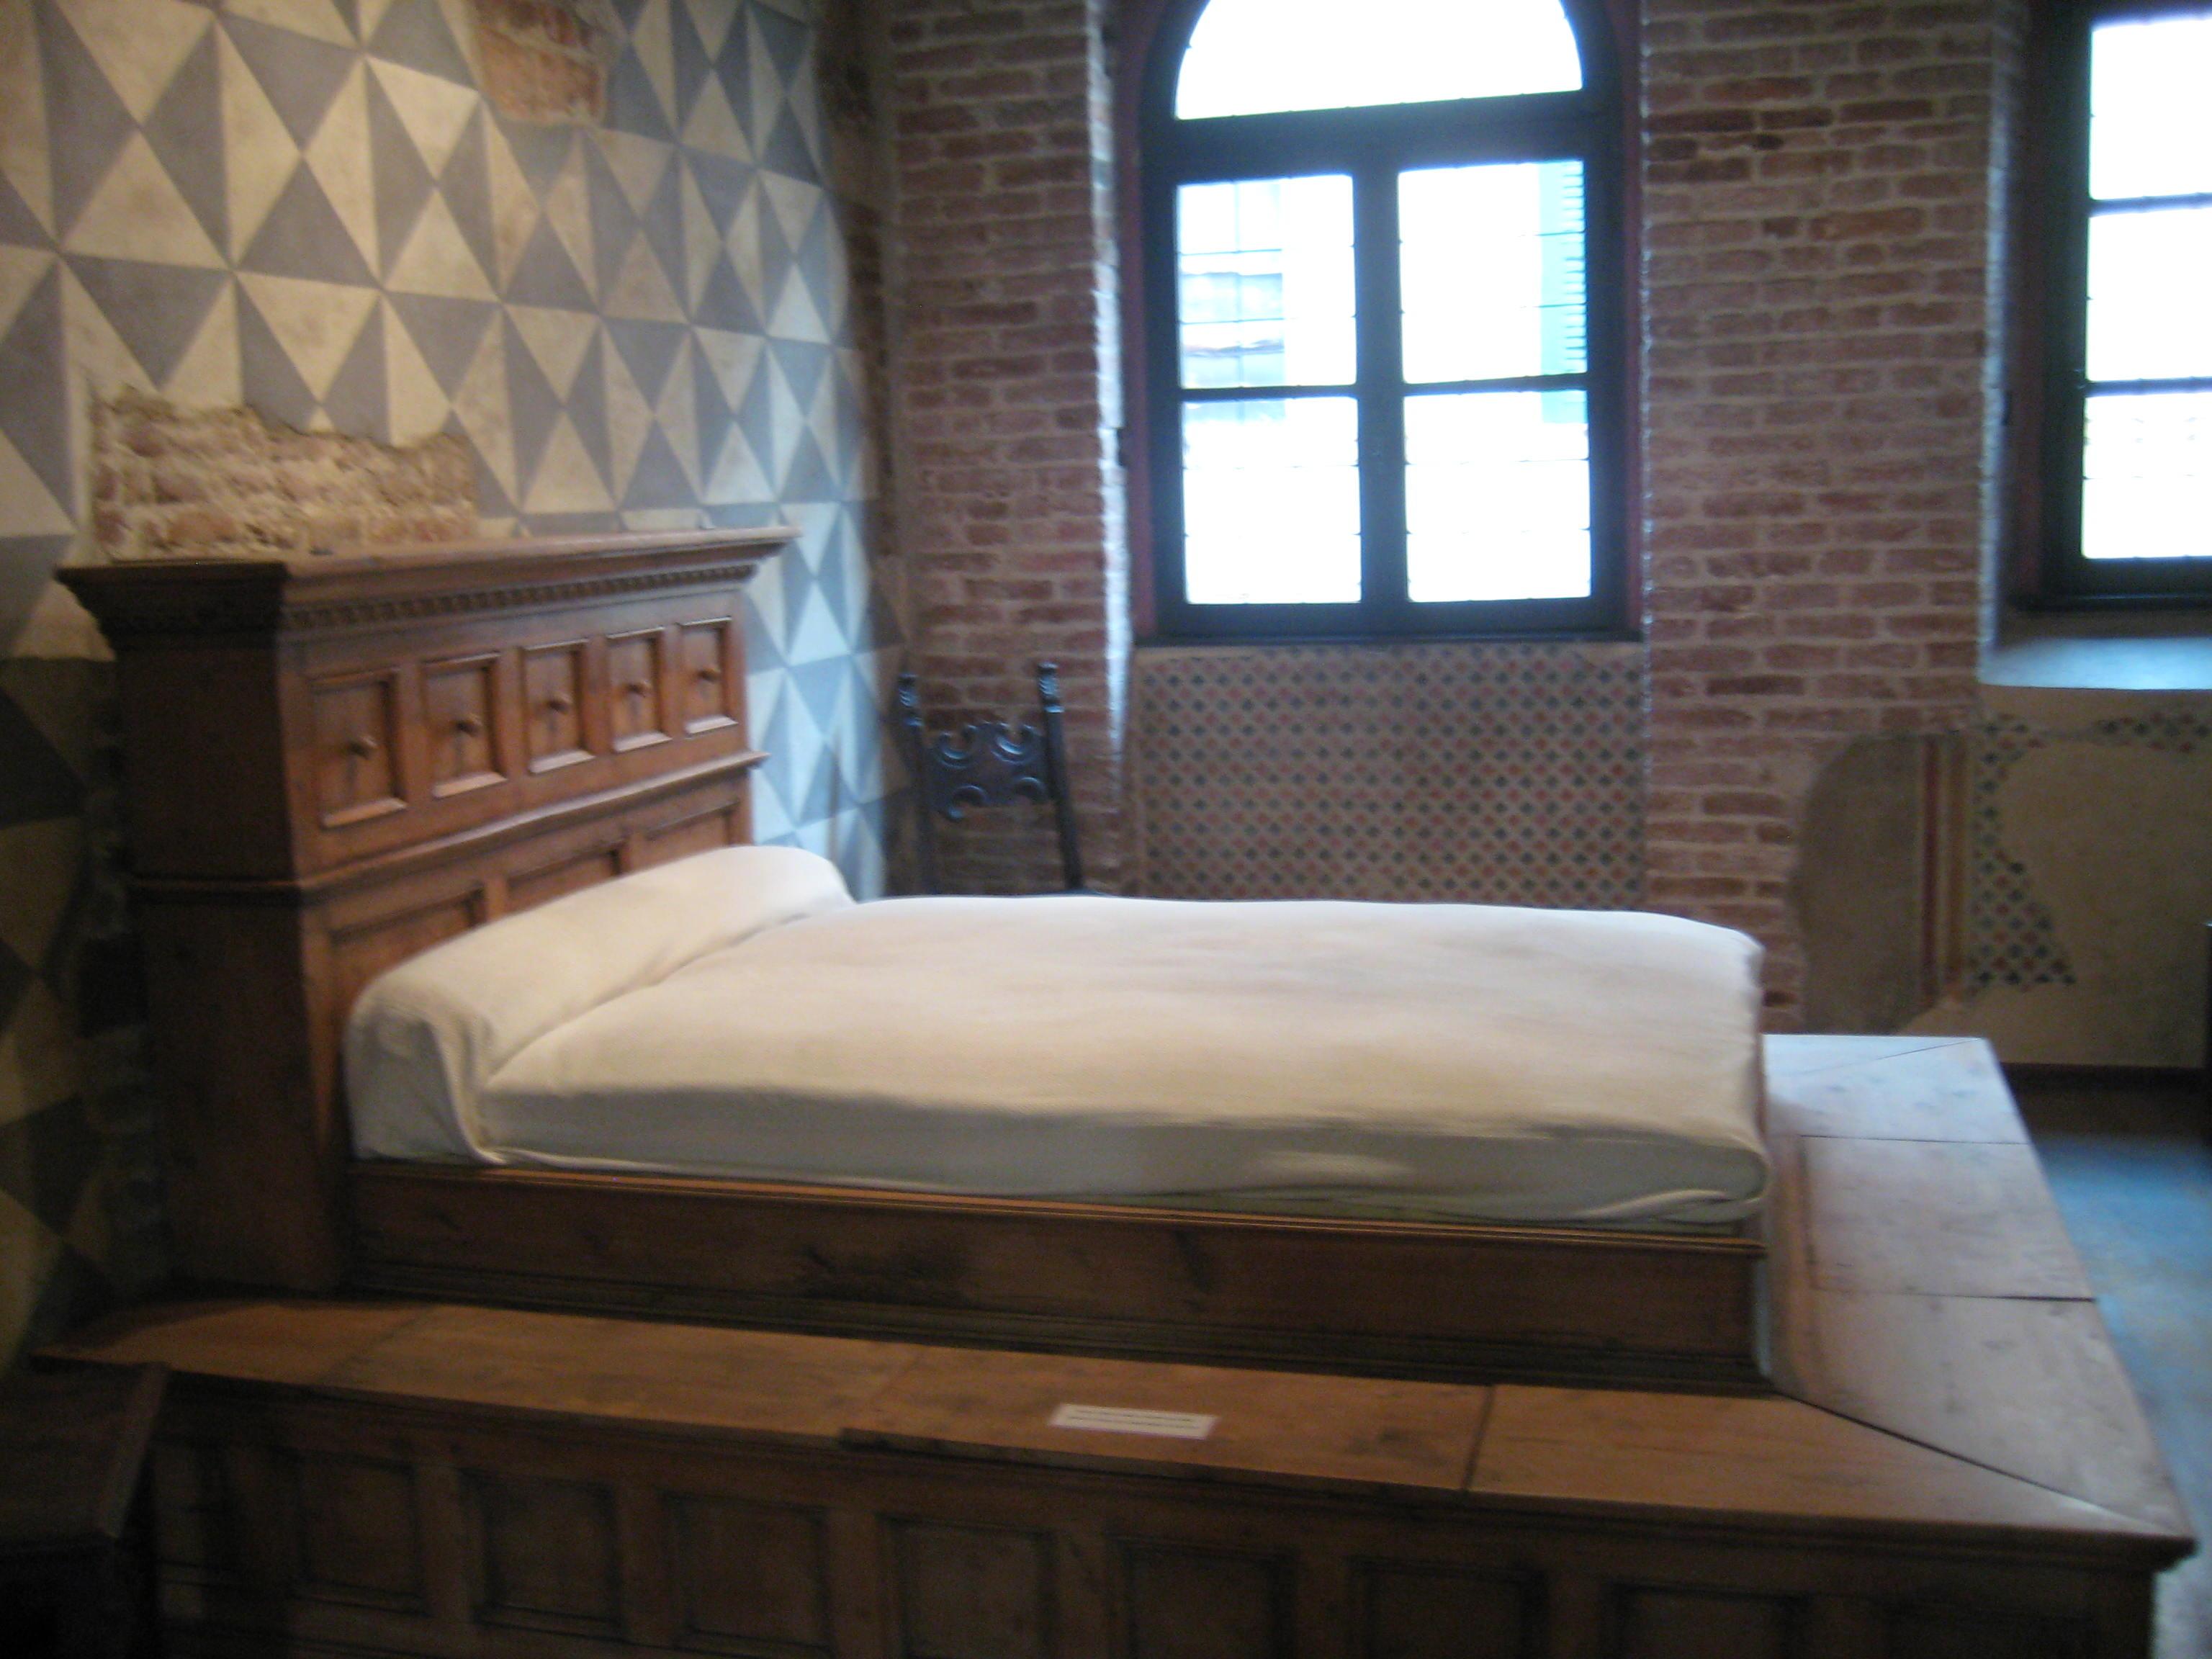 Juliet 1968 Bed | www.imgkid.com - The Image Kid Has It!